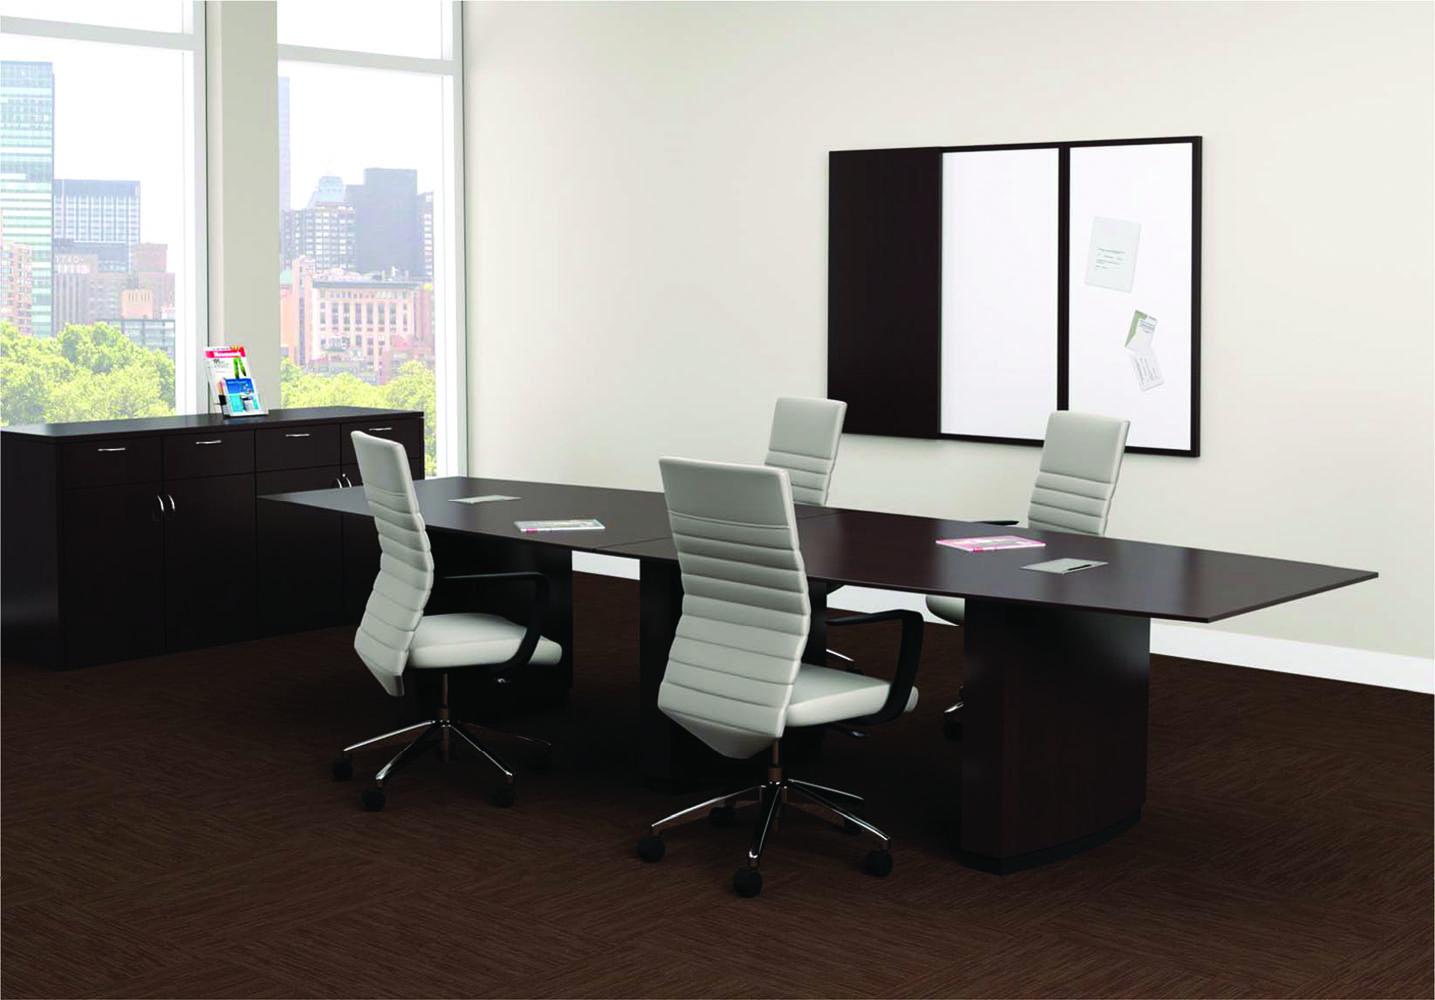 Boardroom Setup Meeting Room Furniture Office